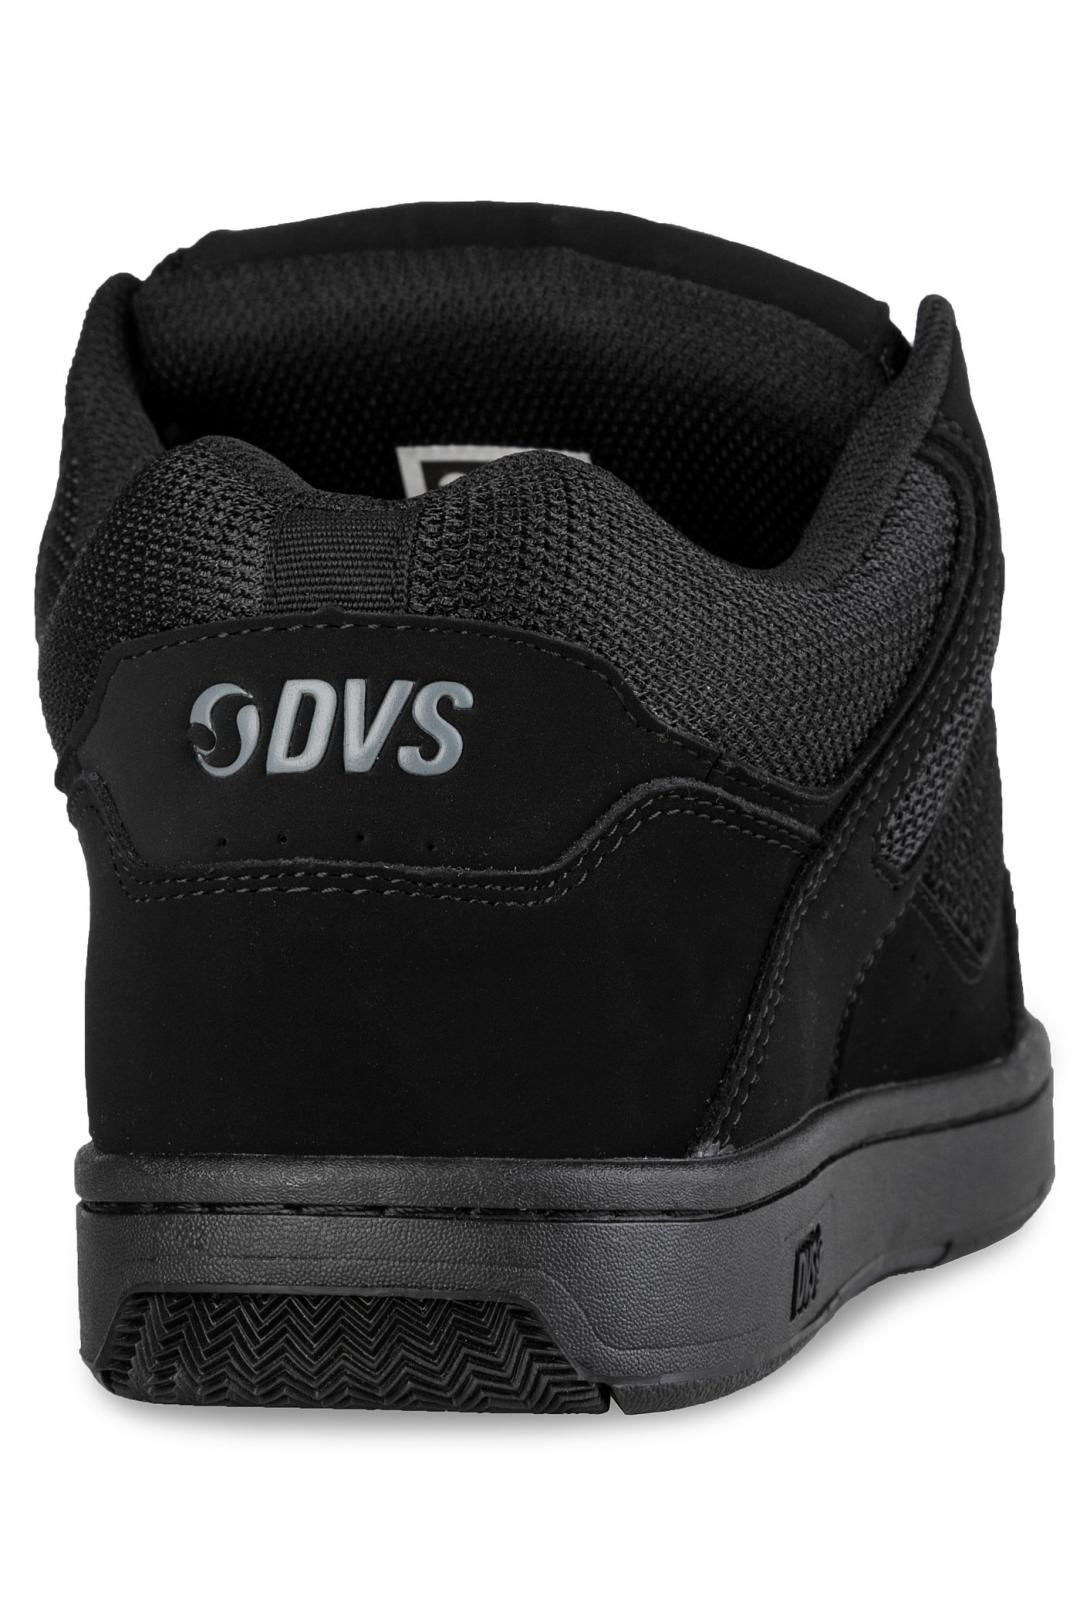 Uomo DVS Enduro 125 Leather black | Scarpe da skate